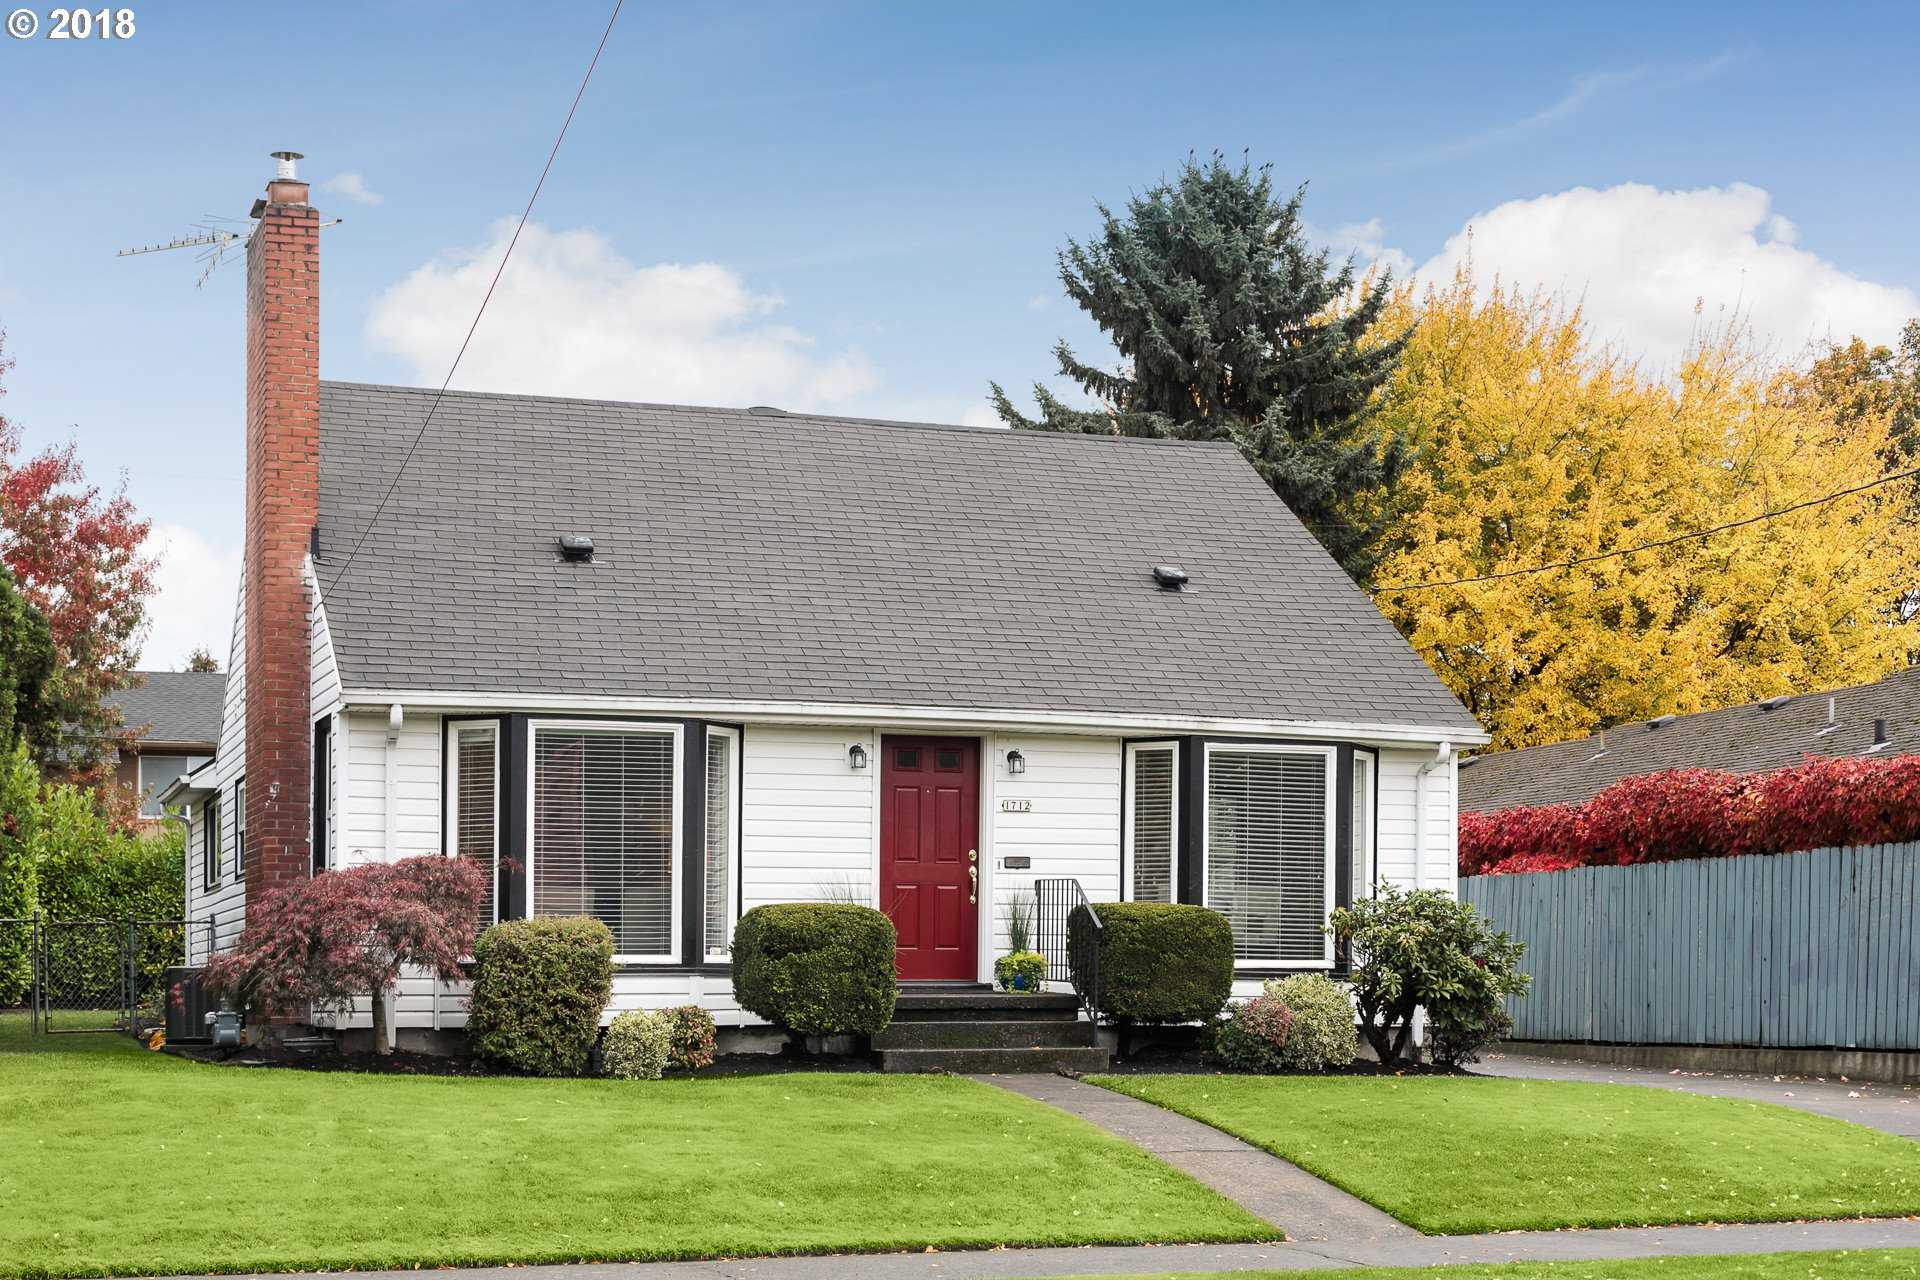 $519,000 - 4Br/2Ba -  for Sale in Rose City Park, Portland